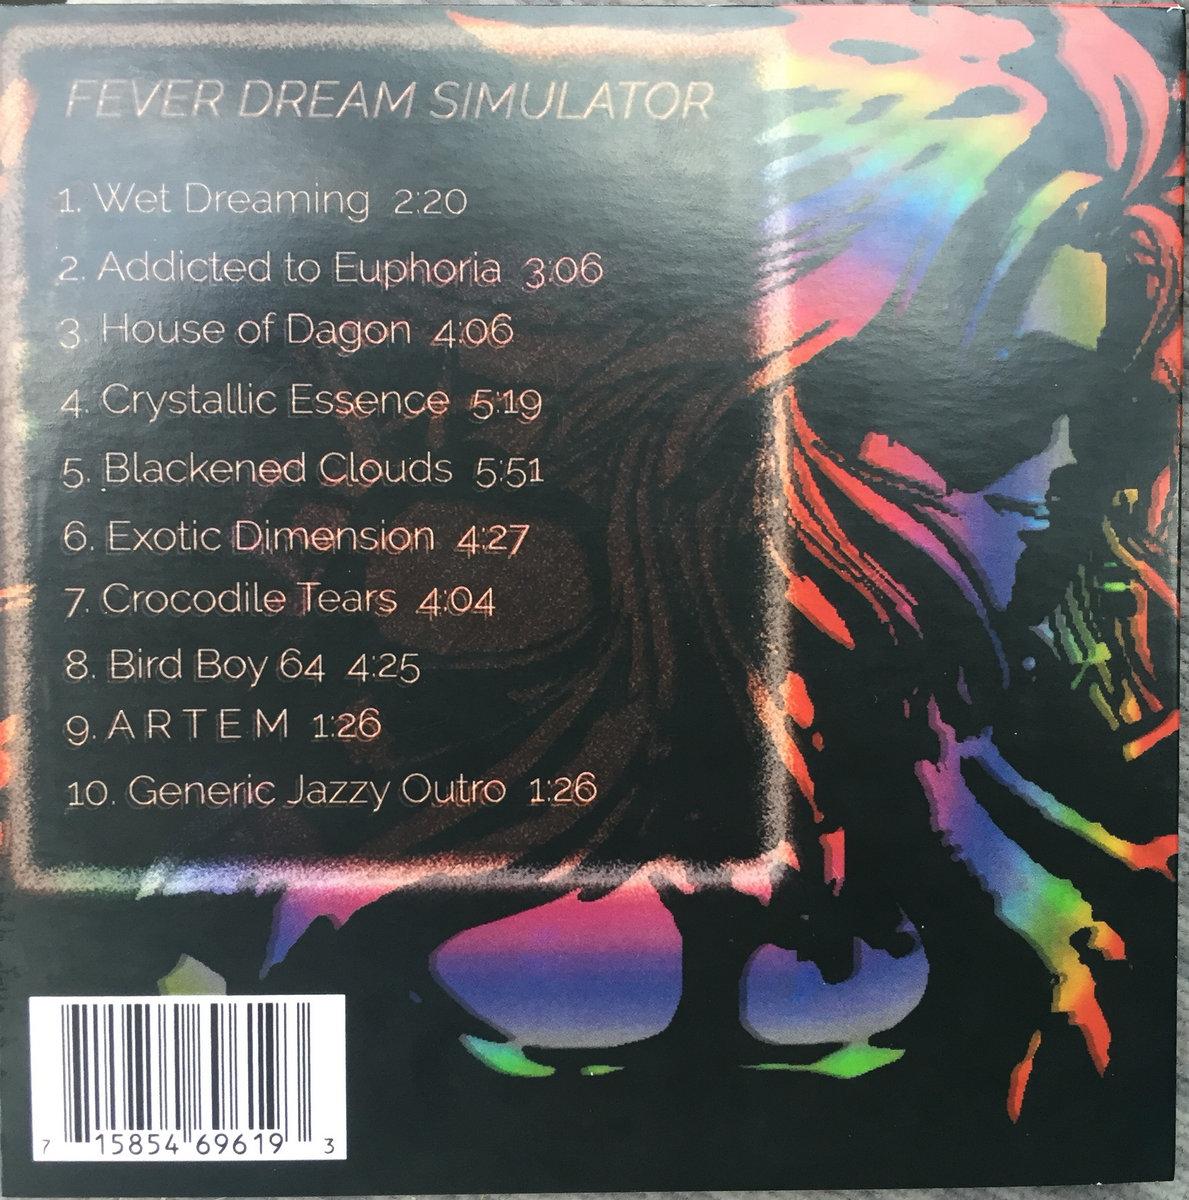 fever dream simulator | pluto castle